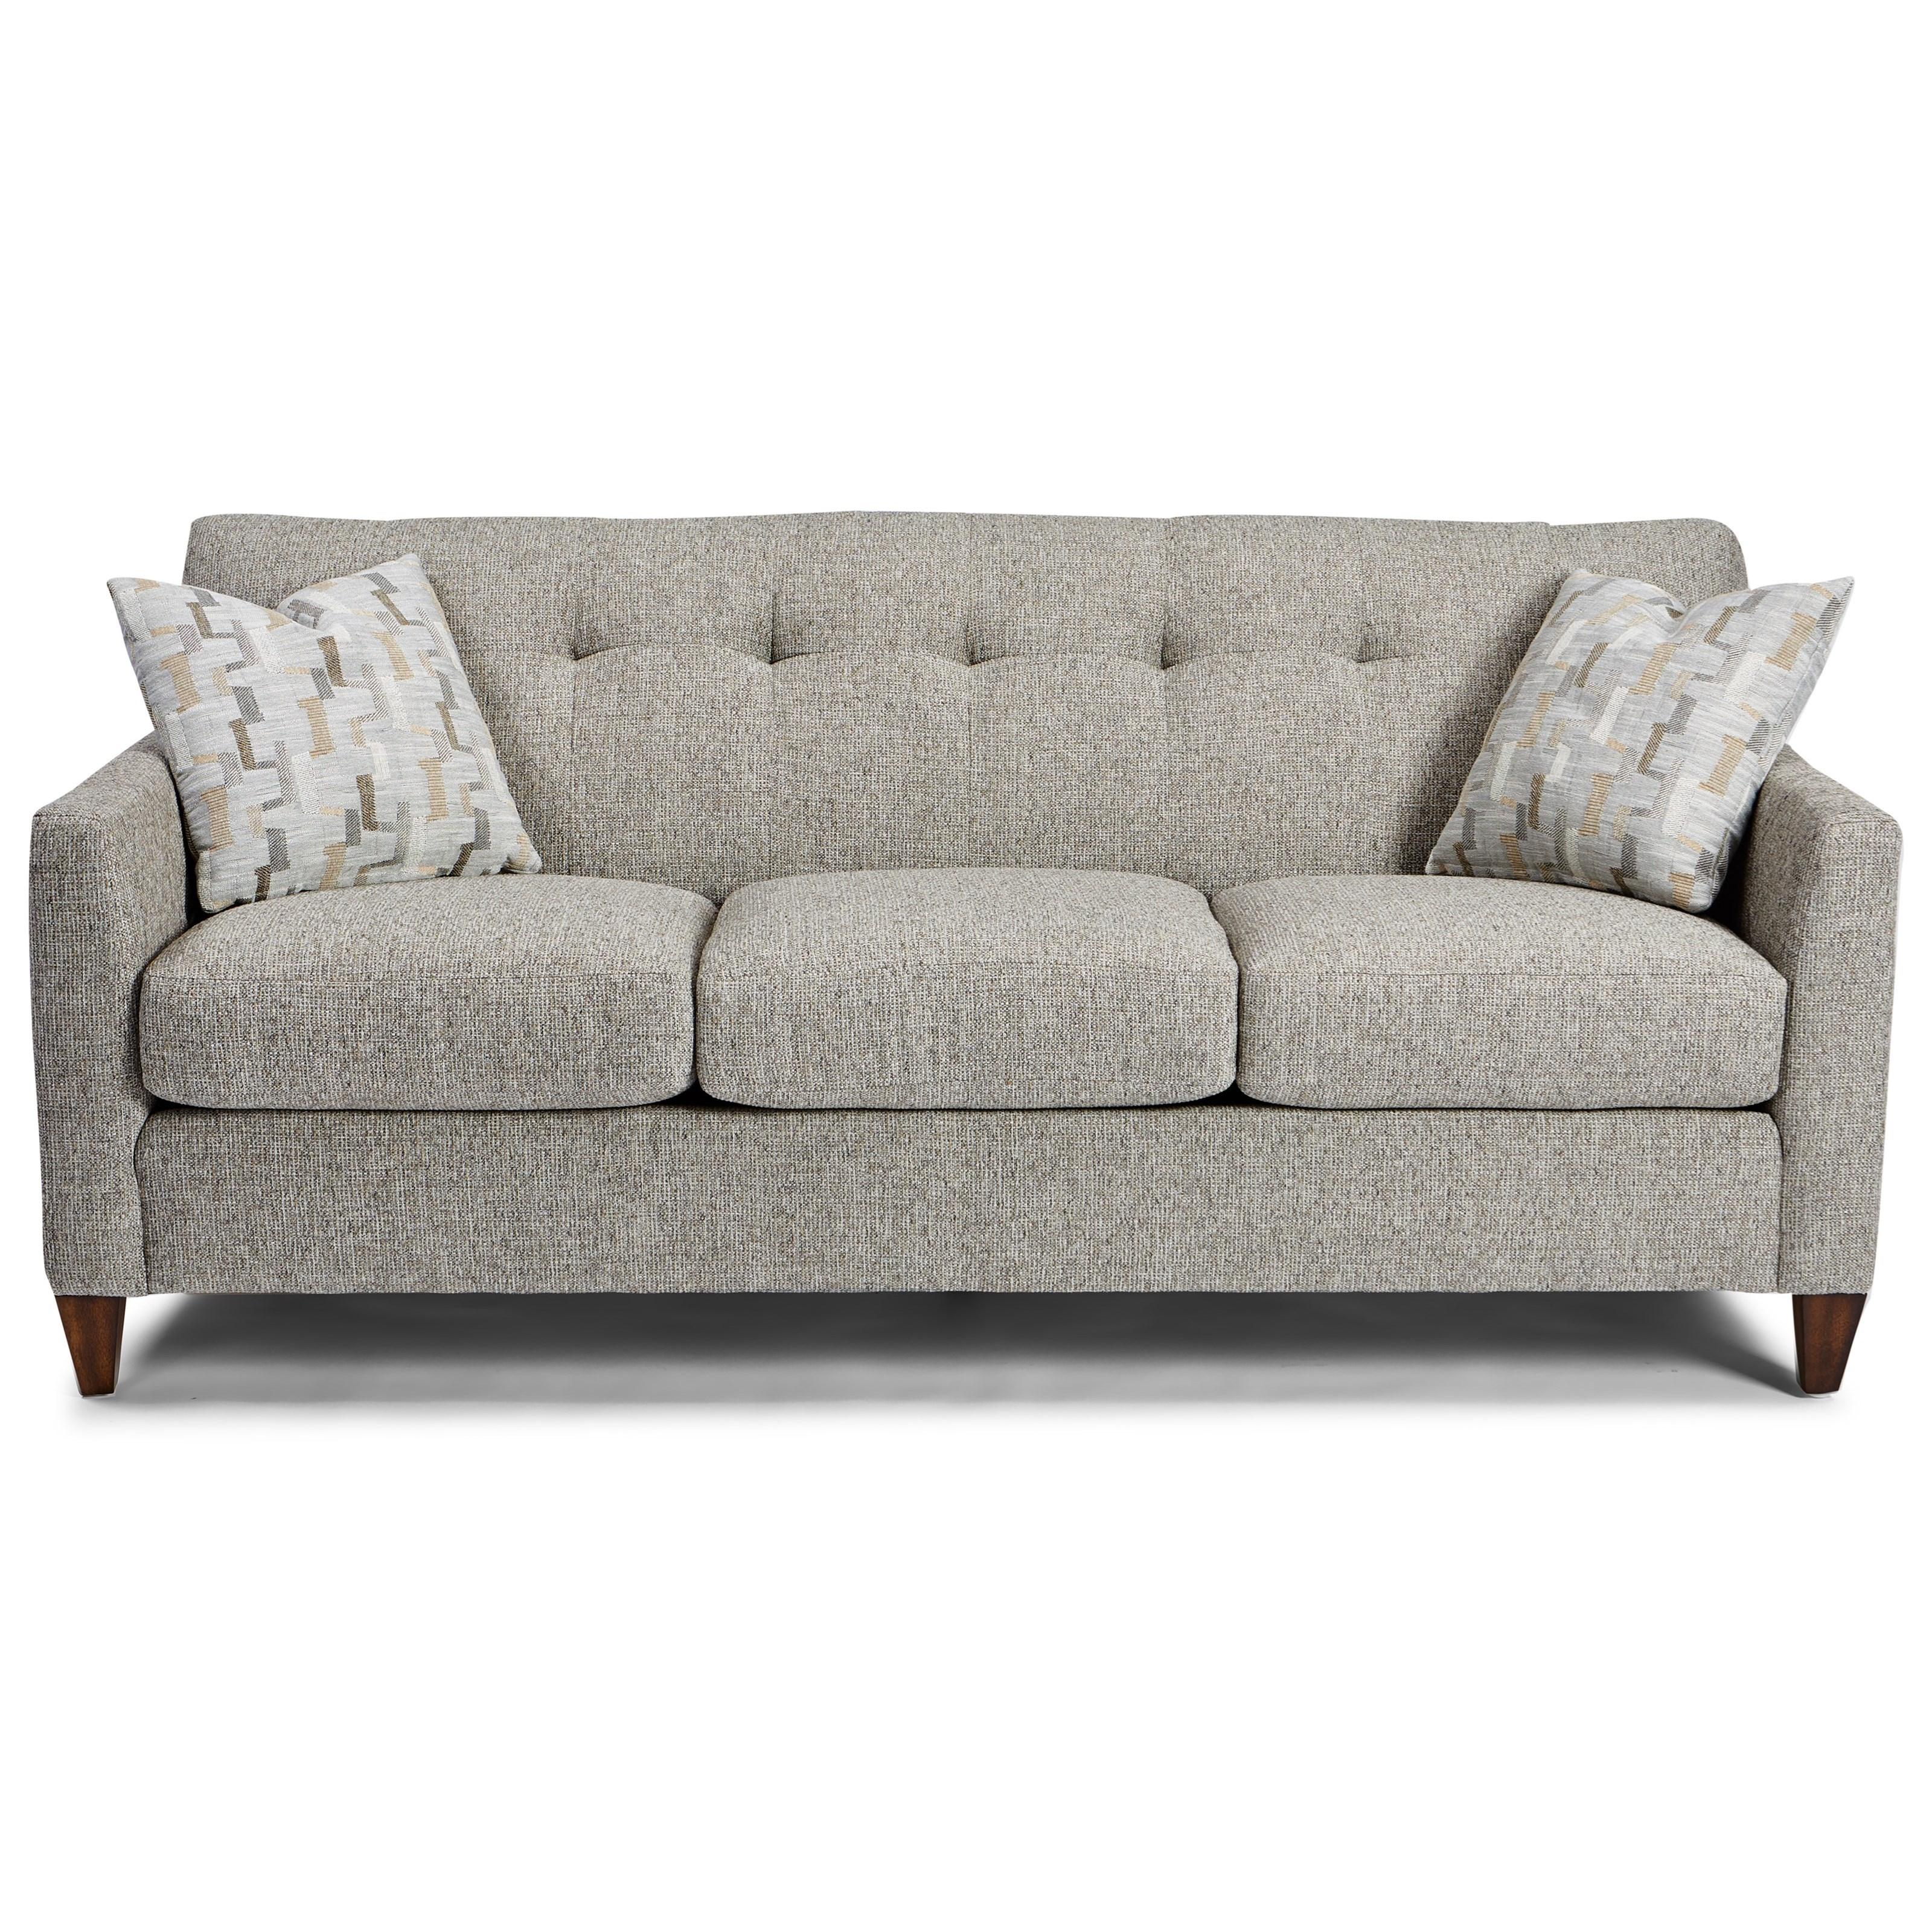 Sutton Sofa  by Flexsteel at Walker's Furniture